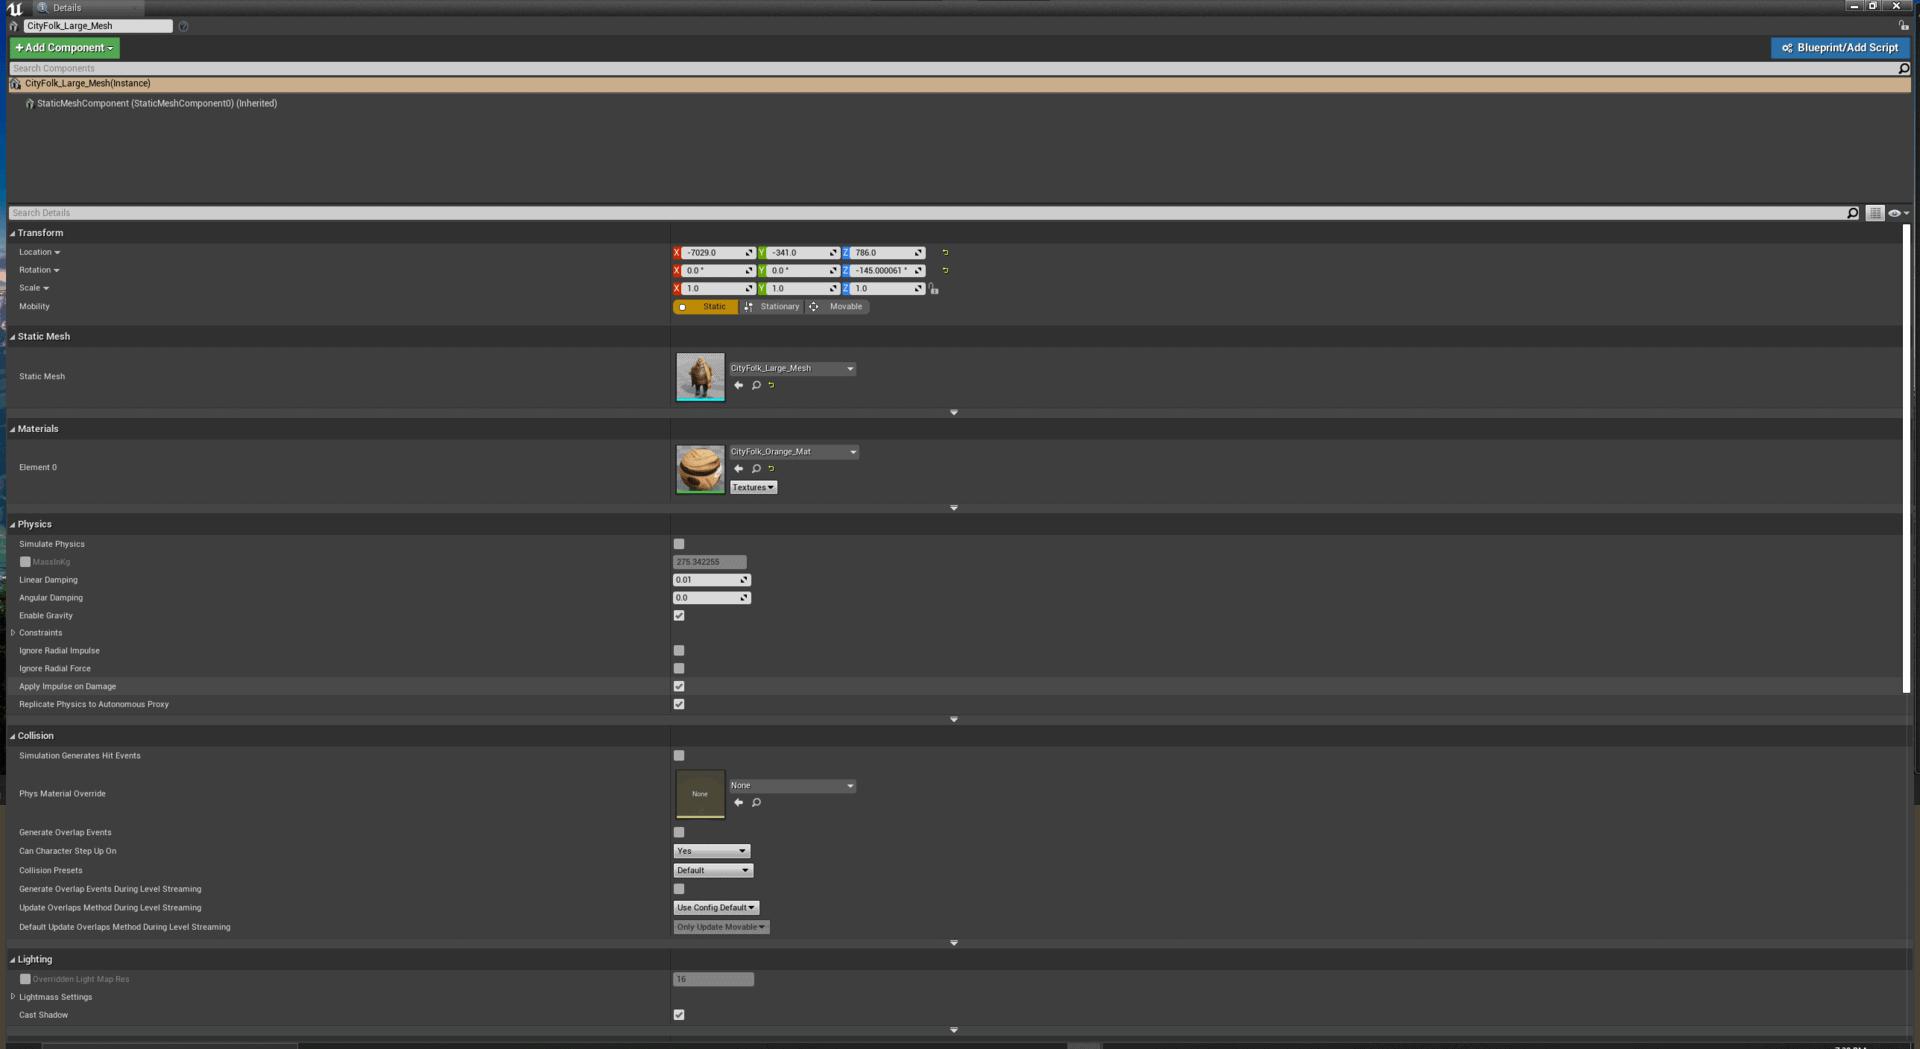 Screenshot 2021-02-23 193826